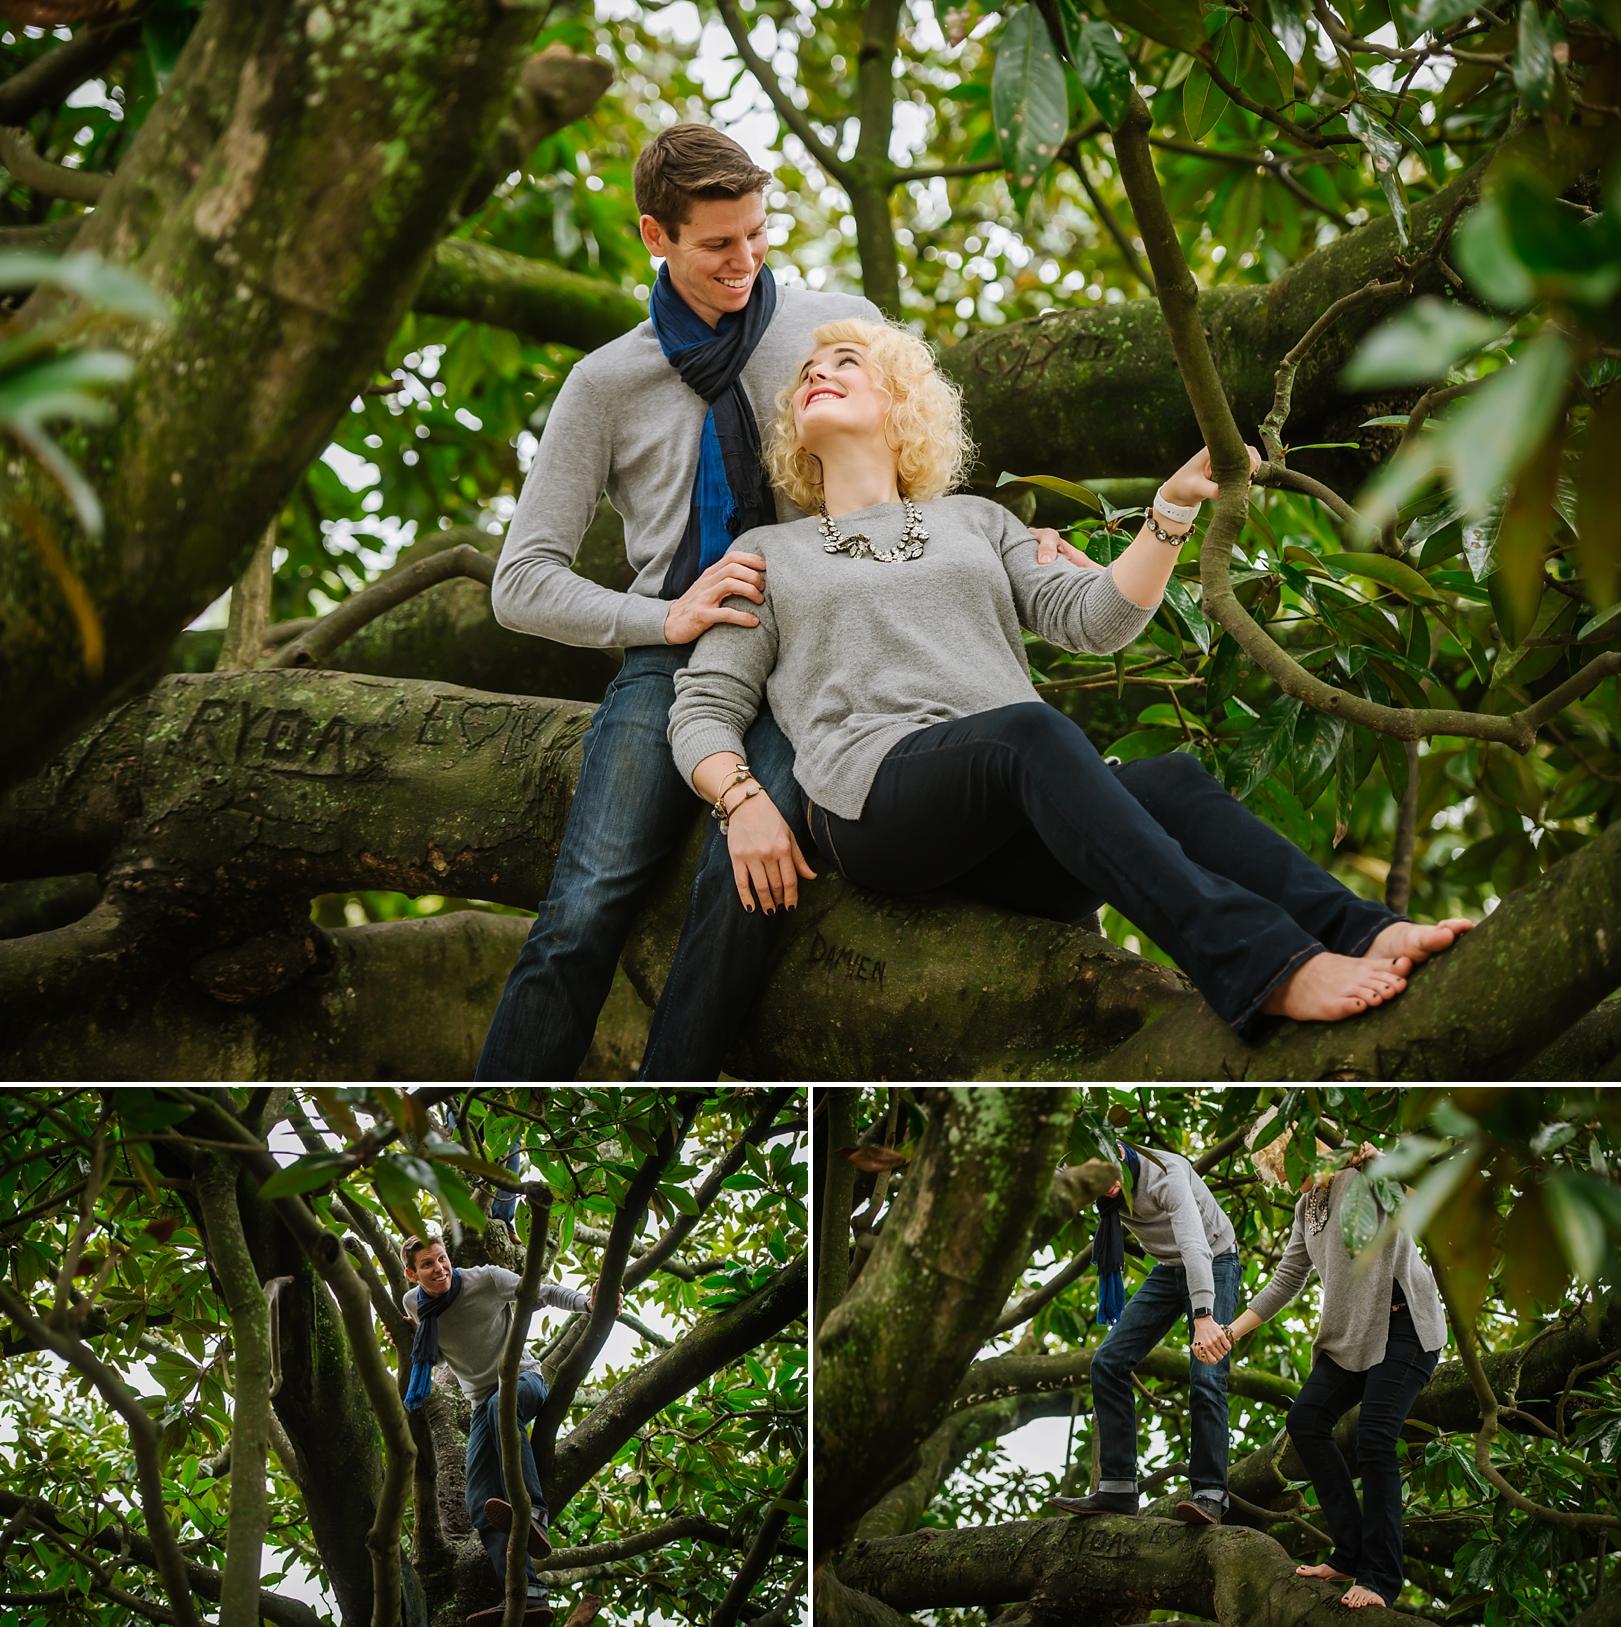 tampa-couple-photography-anniversary-photos-ashlee-hamon_0003.jpg